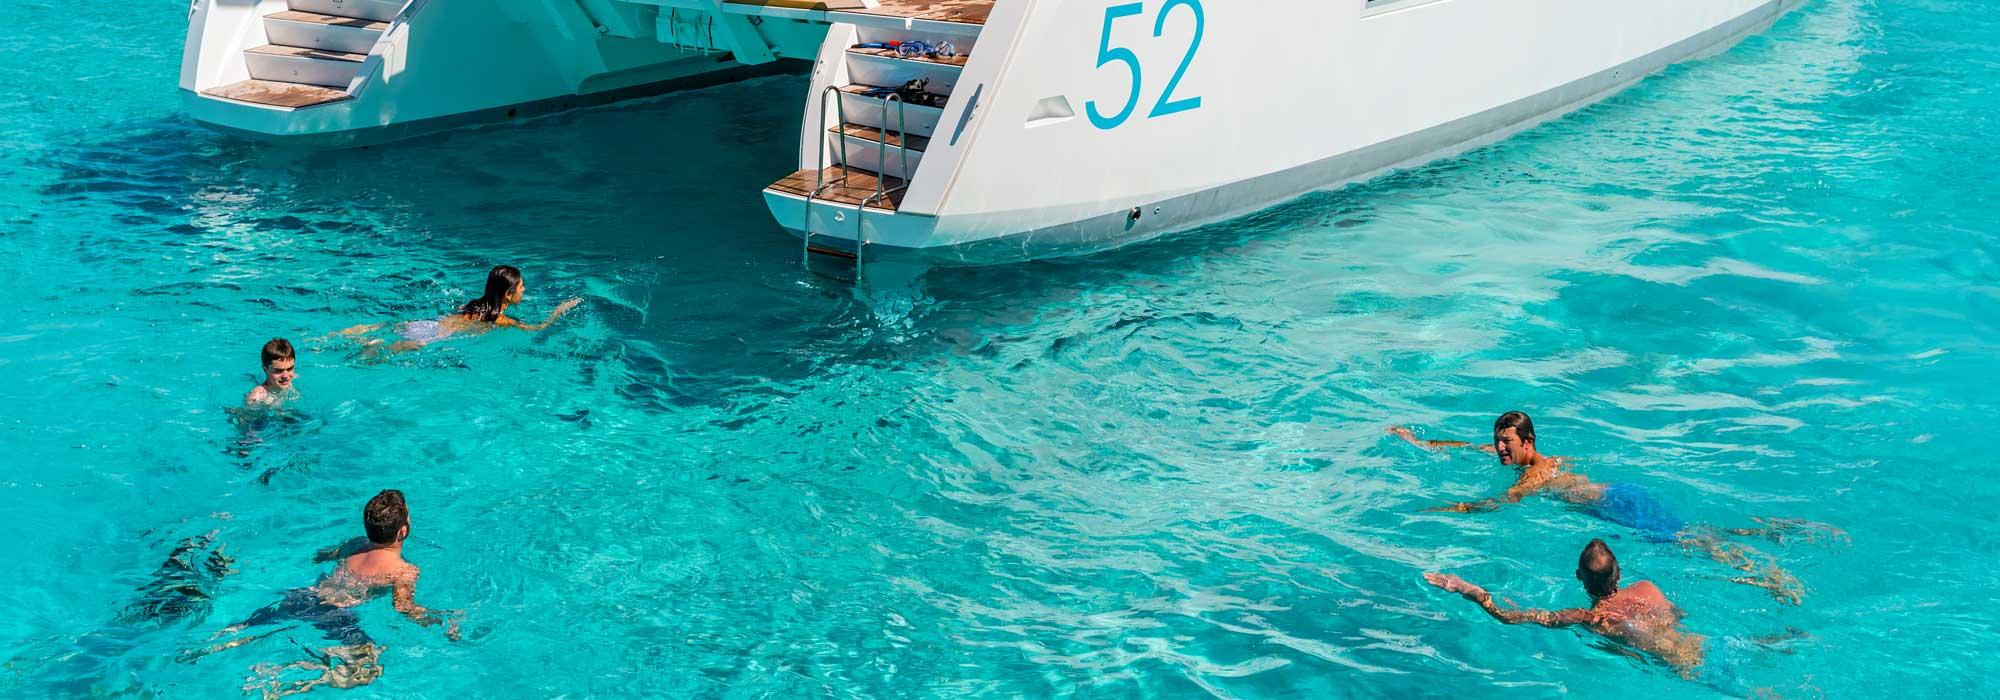 Simpson Yacht Charter Thailand